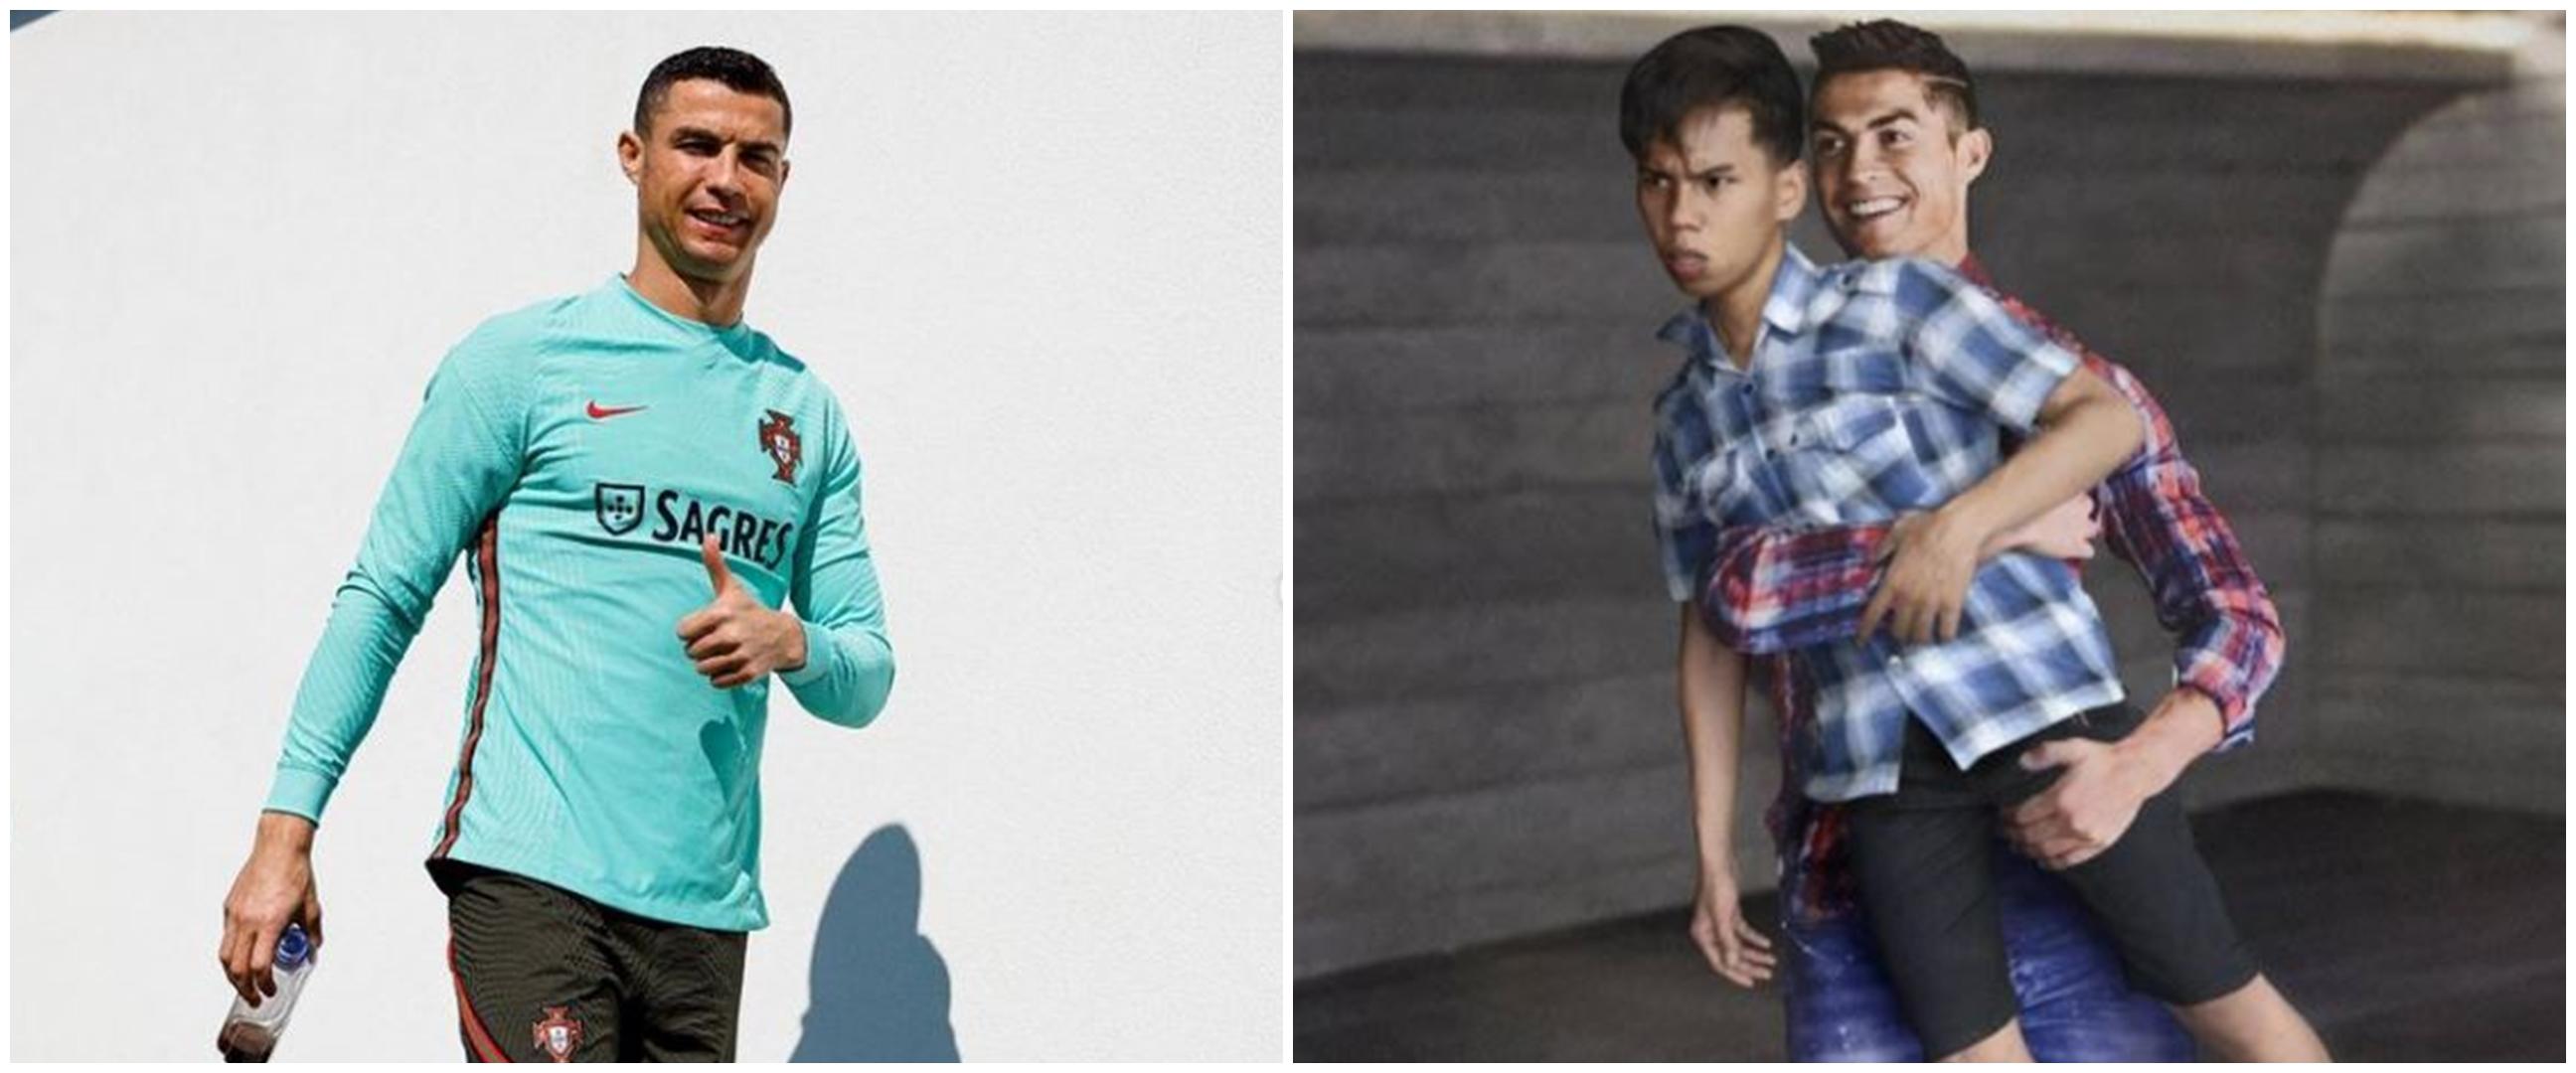 7 Editan lucu fans foto bareng Cristiano Ronaldo, absurd abis